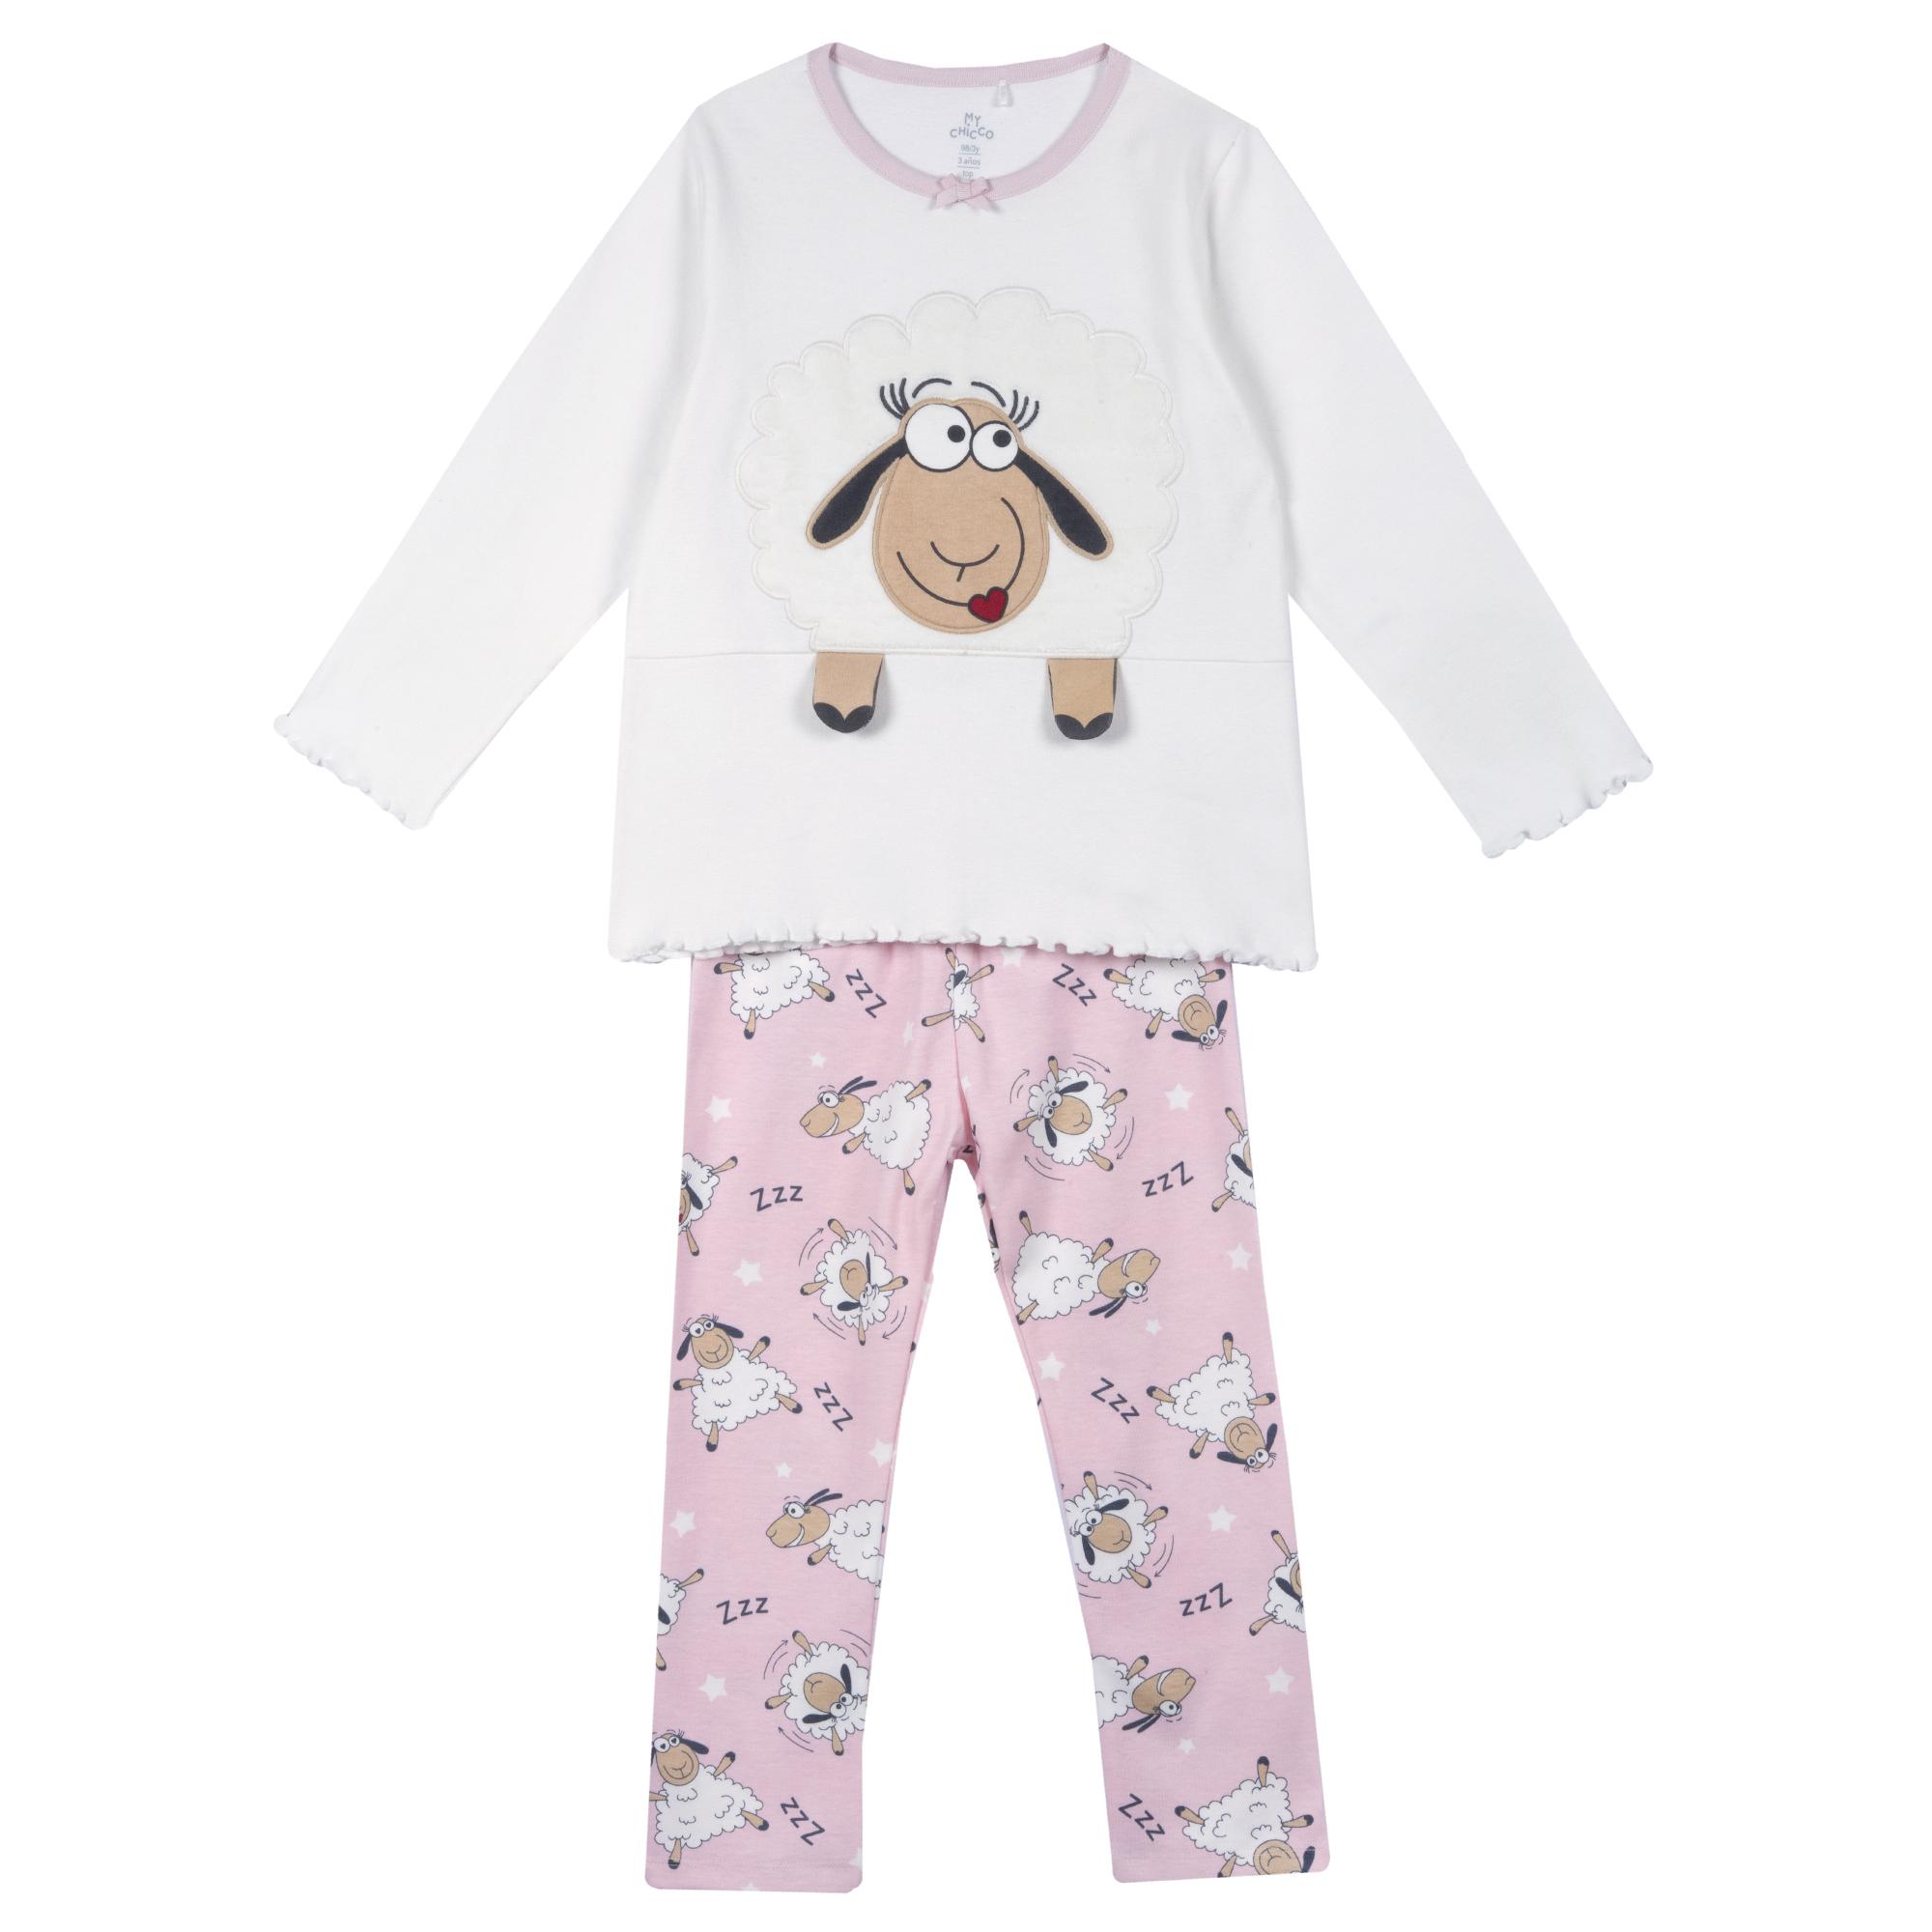 Pijama Copii Chicco, Bluza Si Pantalon, Alb, 31334 imagine